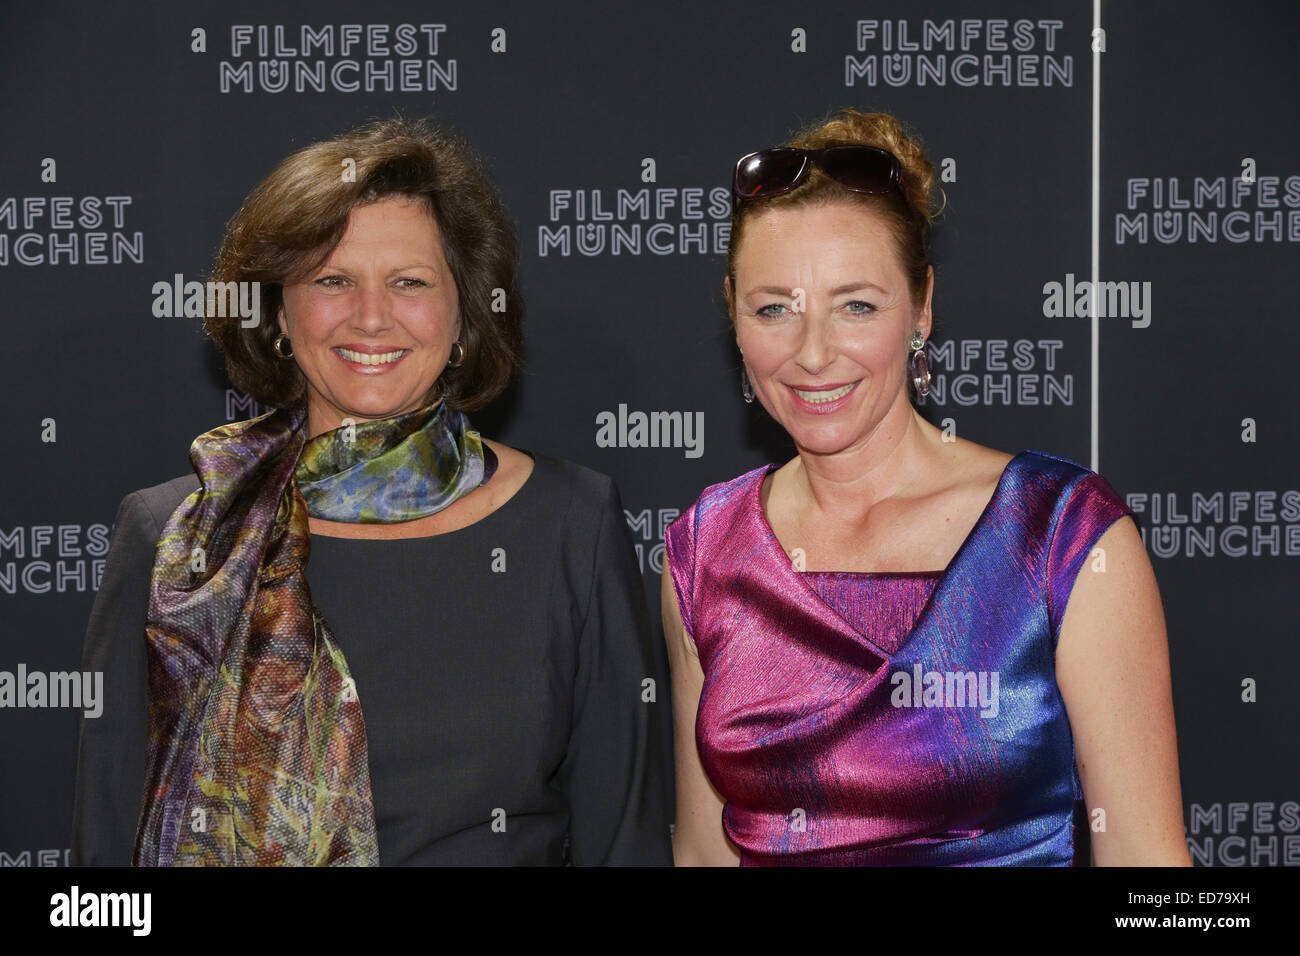 neuartiger Stil tolle Passform neuer Lebensstil Celebrities attending the opening night of the Munich Film ...